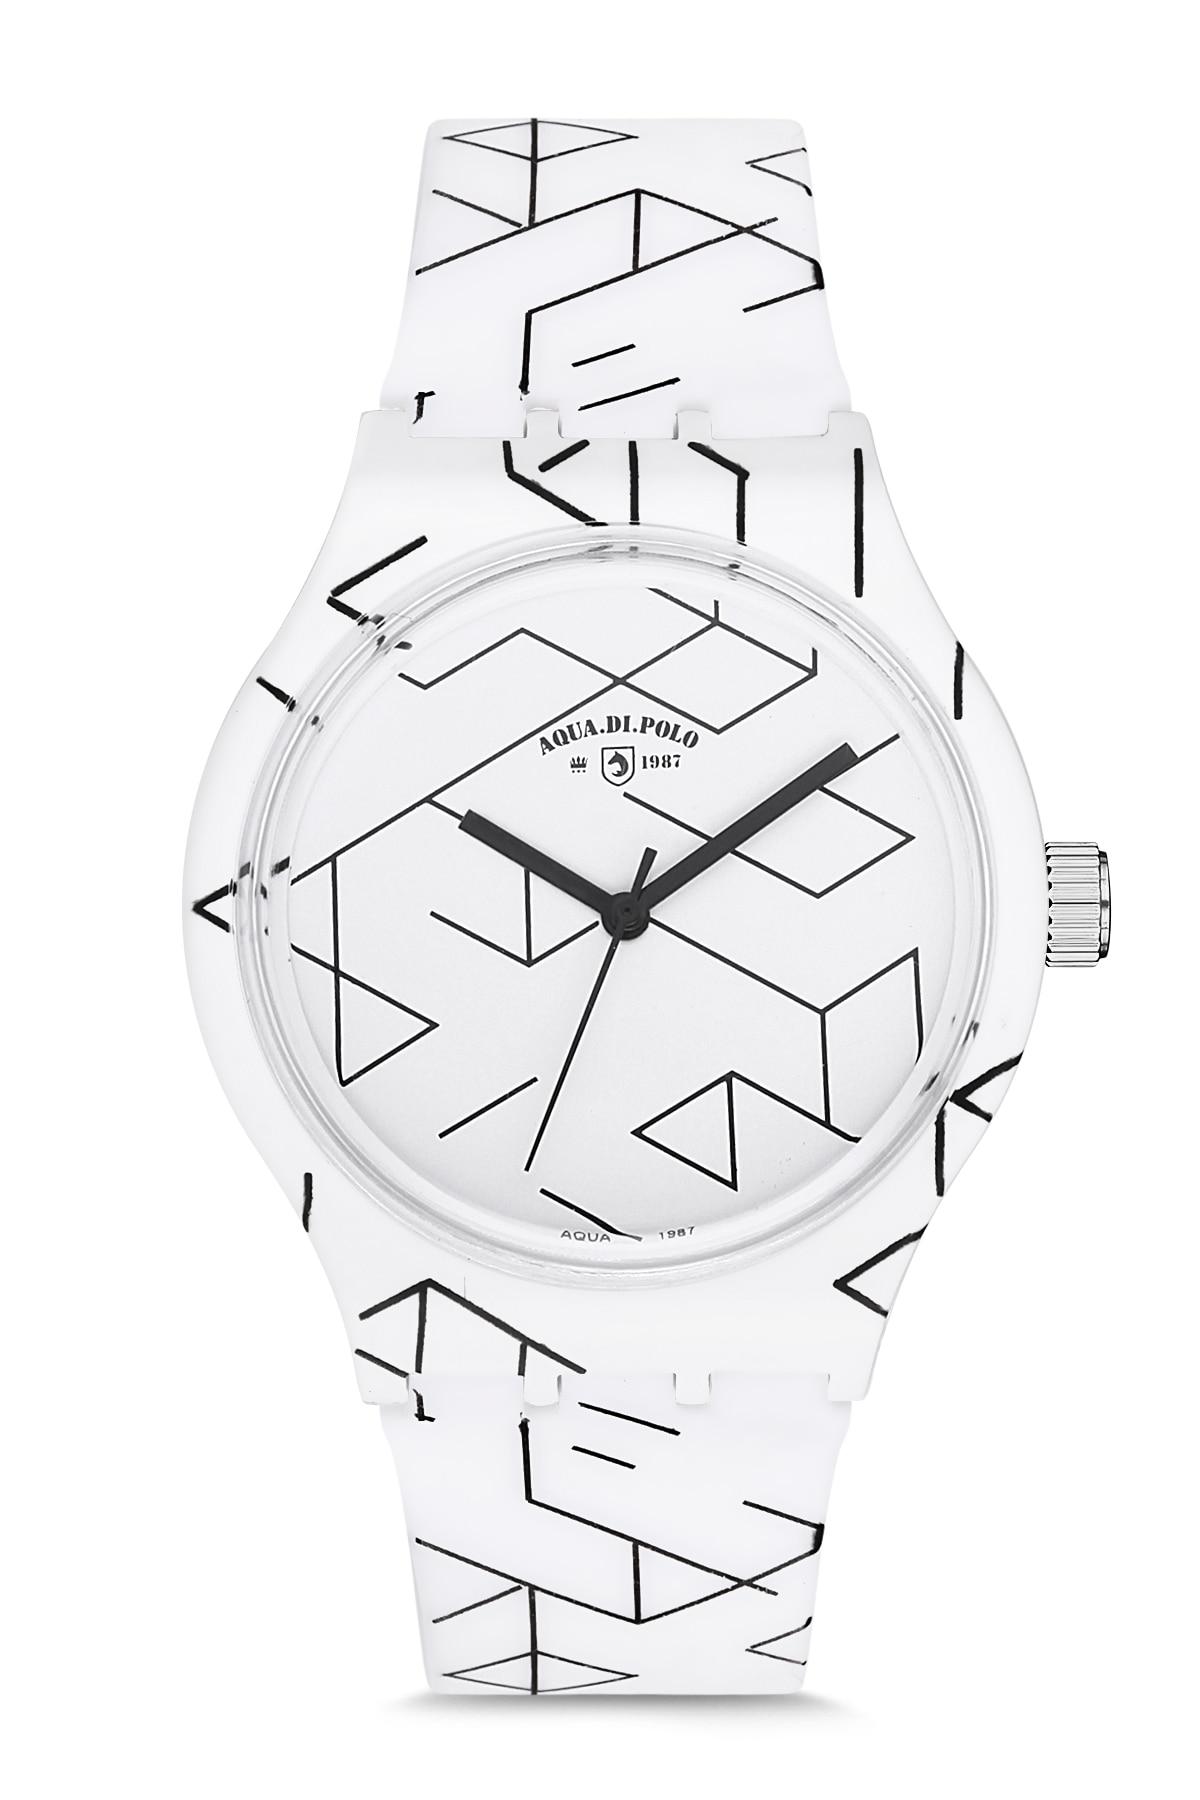 Aqua di polo APSV1-A5531-US555 silicone unisex relógio de pulso mulher masculina moda silicone banda relógio de pulso estilo simples geométrico pat